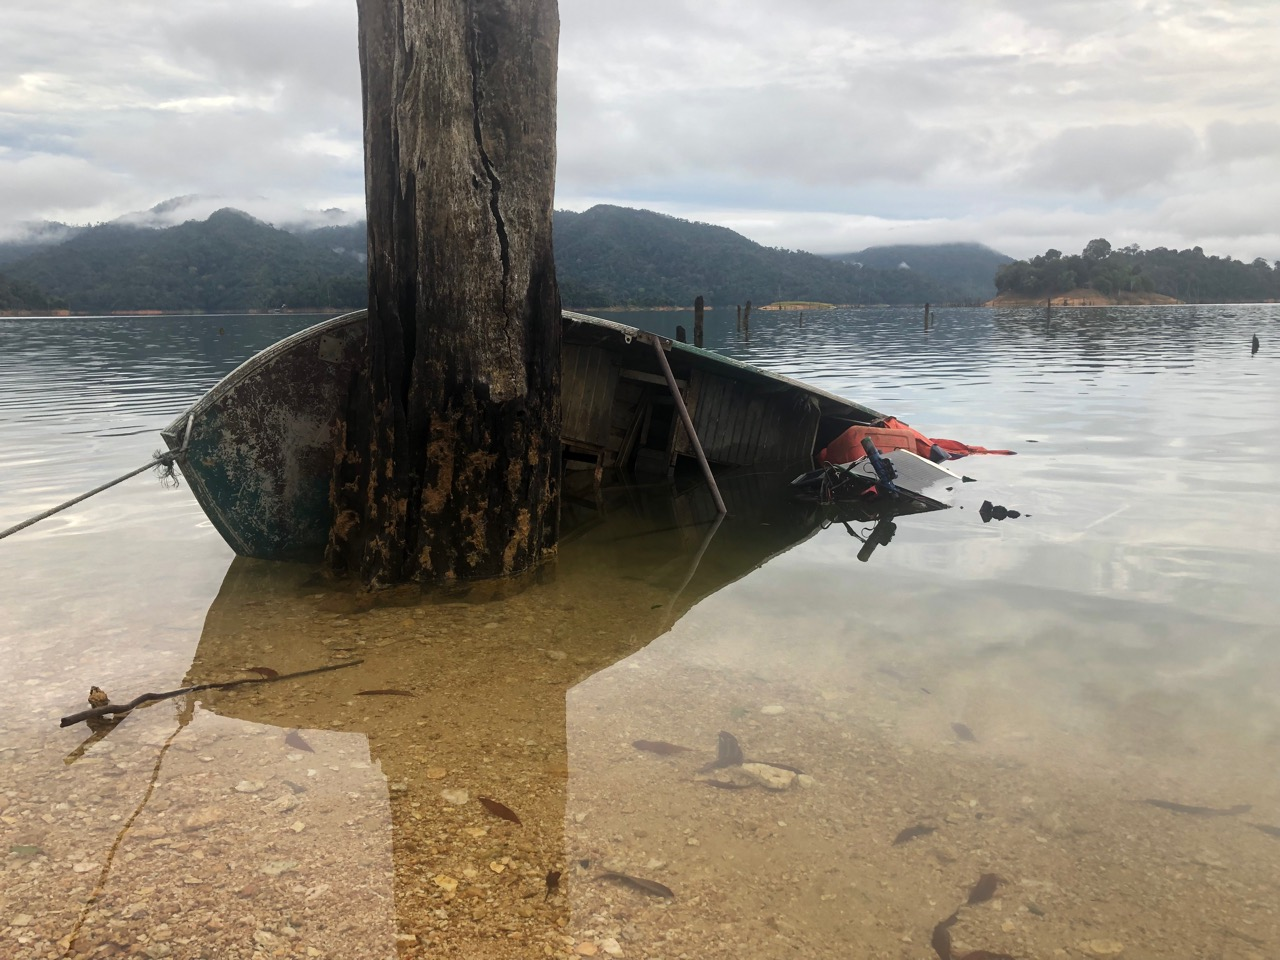 The capsized Rocket